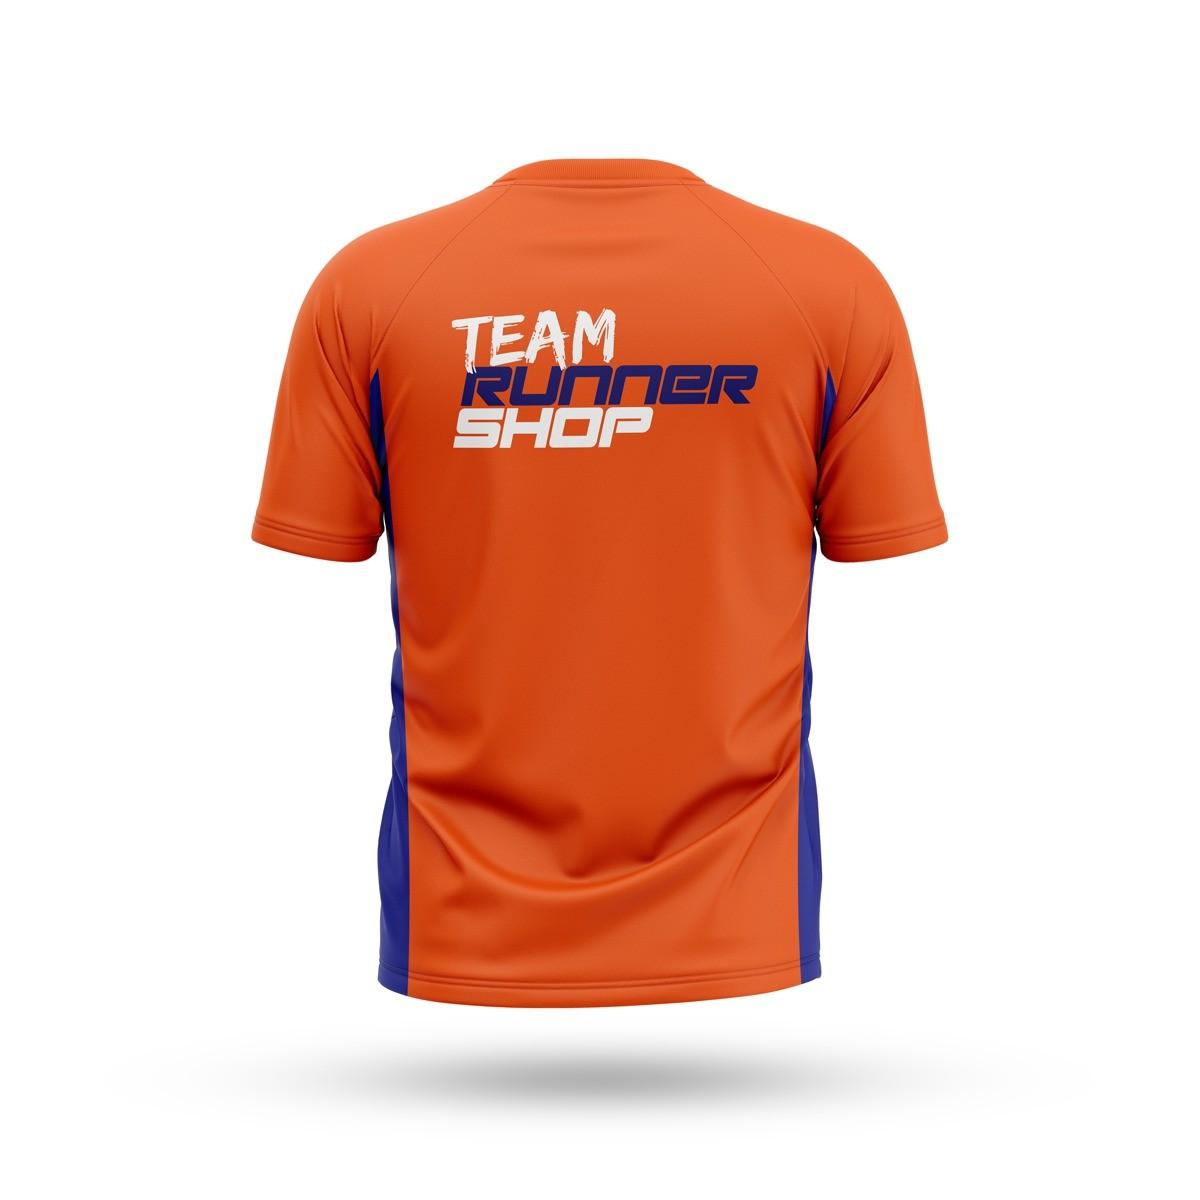 Camiseta 3 Anos Runner Shop | RS TEAM